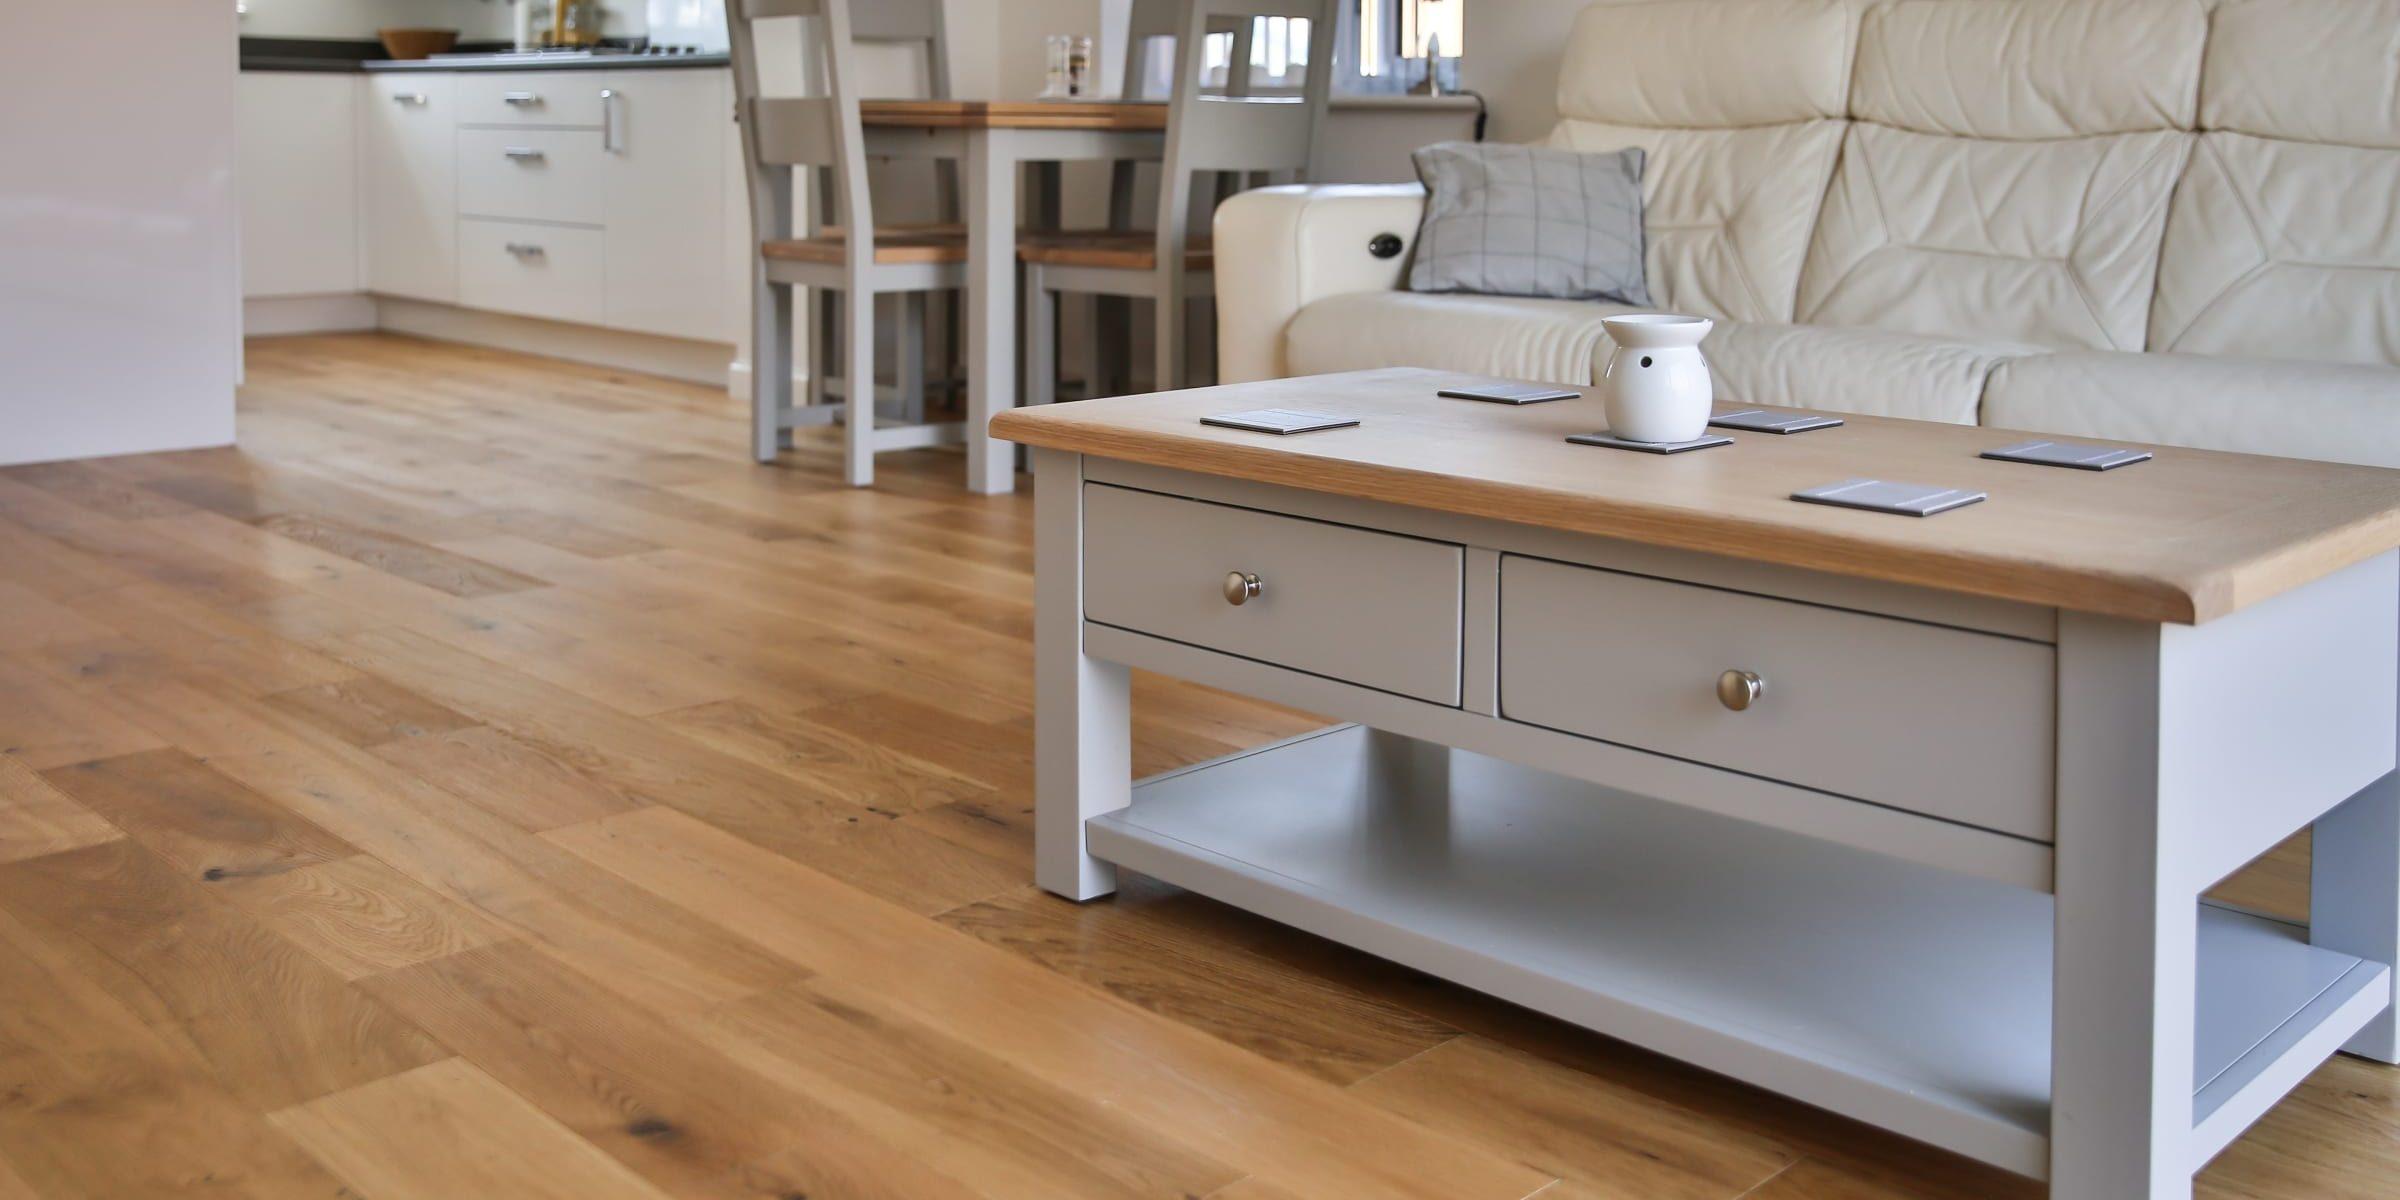 Swindon home with Eiger Petit wood floors 12